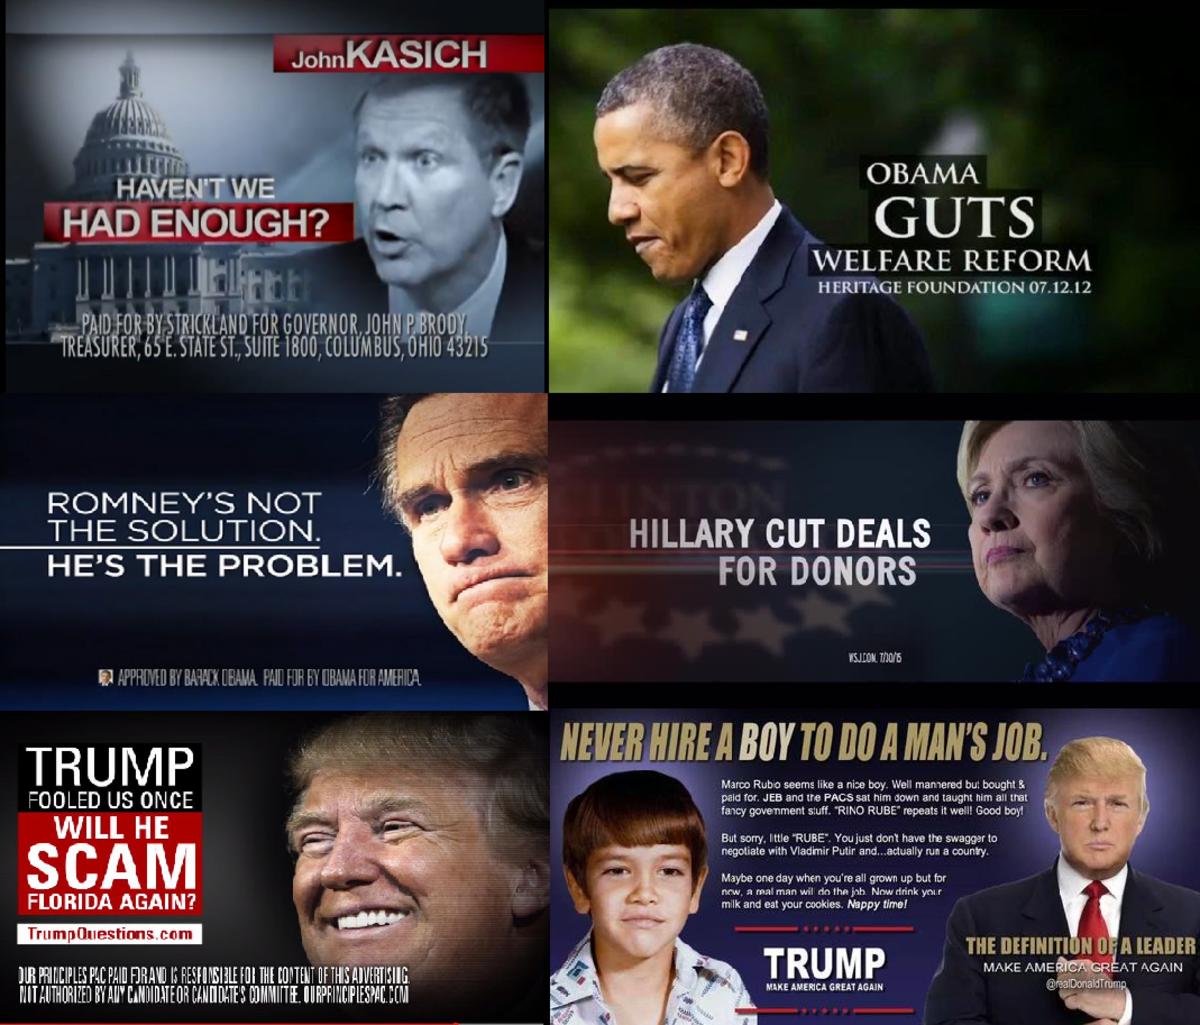 Political attack ads - Marco Rubio, Hillary Clinton, Donald Trump, Barack Obama, Mitt Romney, John Kasich